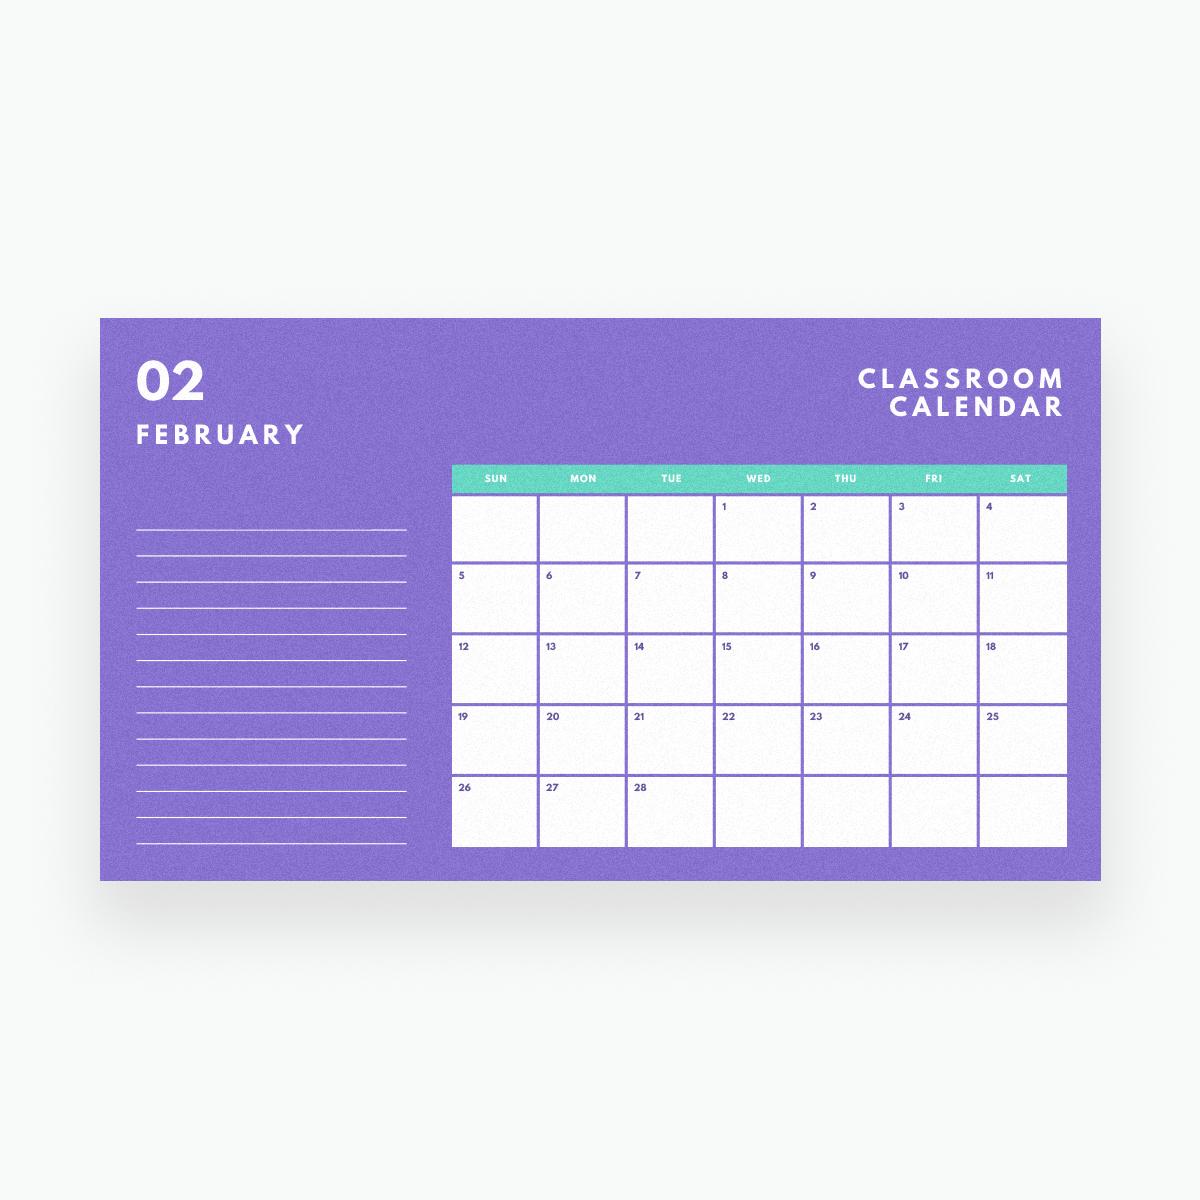 Free Online Calendar Maker: Design A Custom Calendar – Canva Calendar 2019 Generator